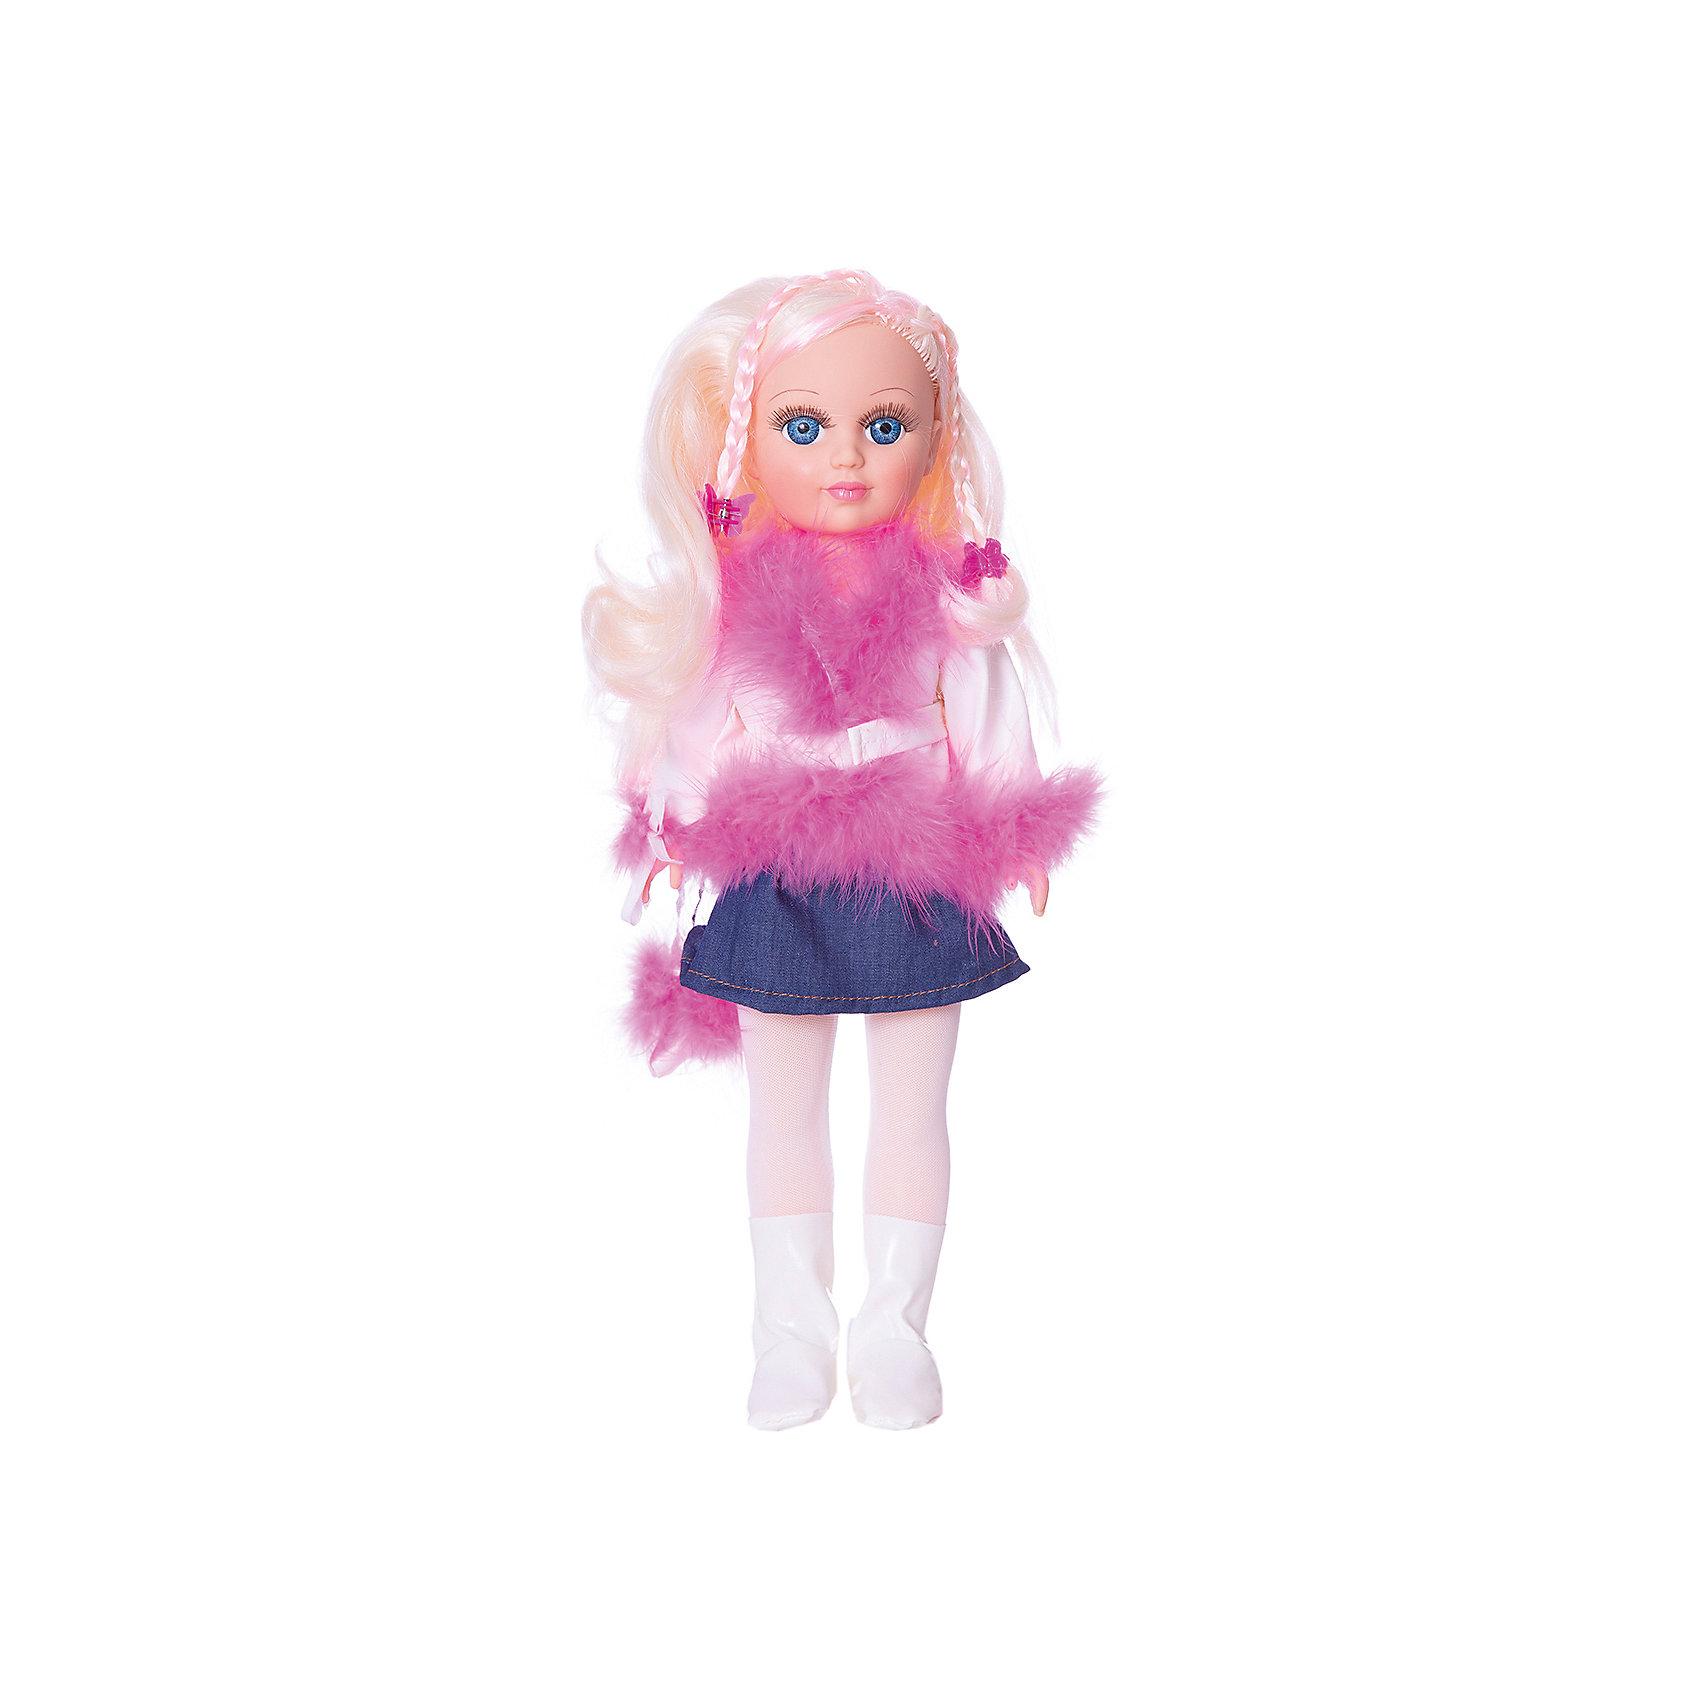 Весна Кукла Анастасия, со звуком, 40 см, Весна кукла весна инна в куртке со звуком 43 см